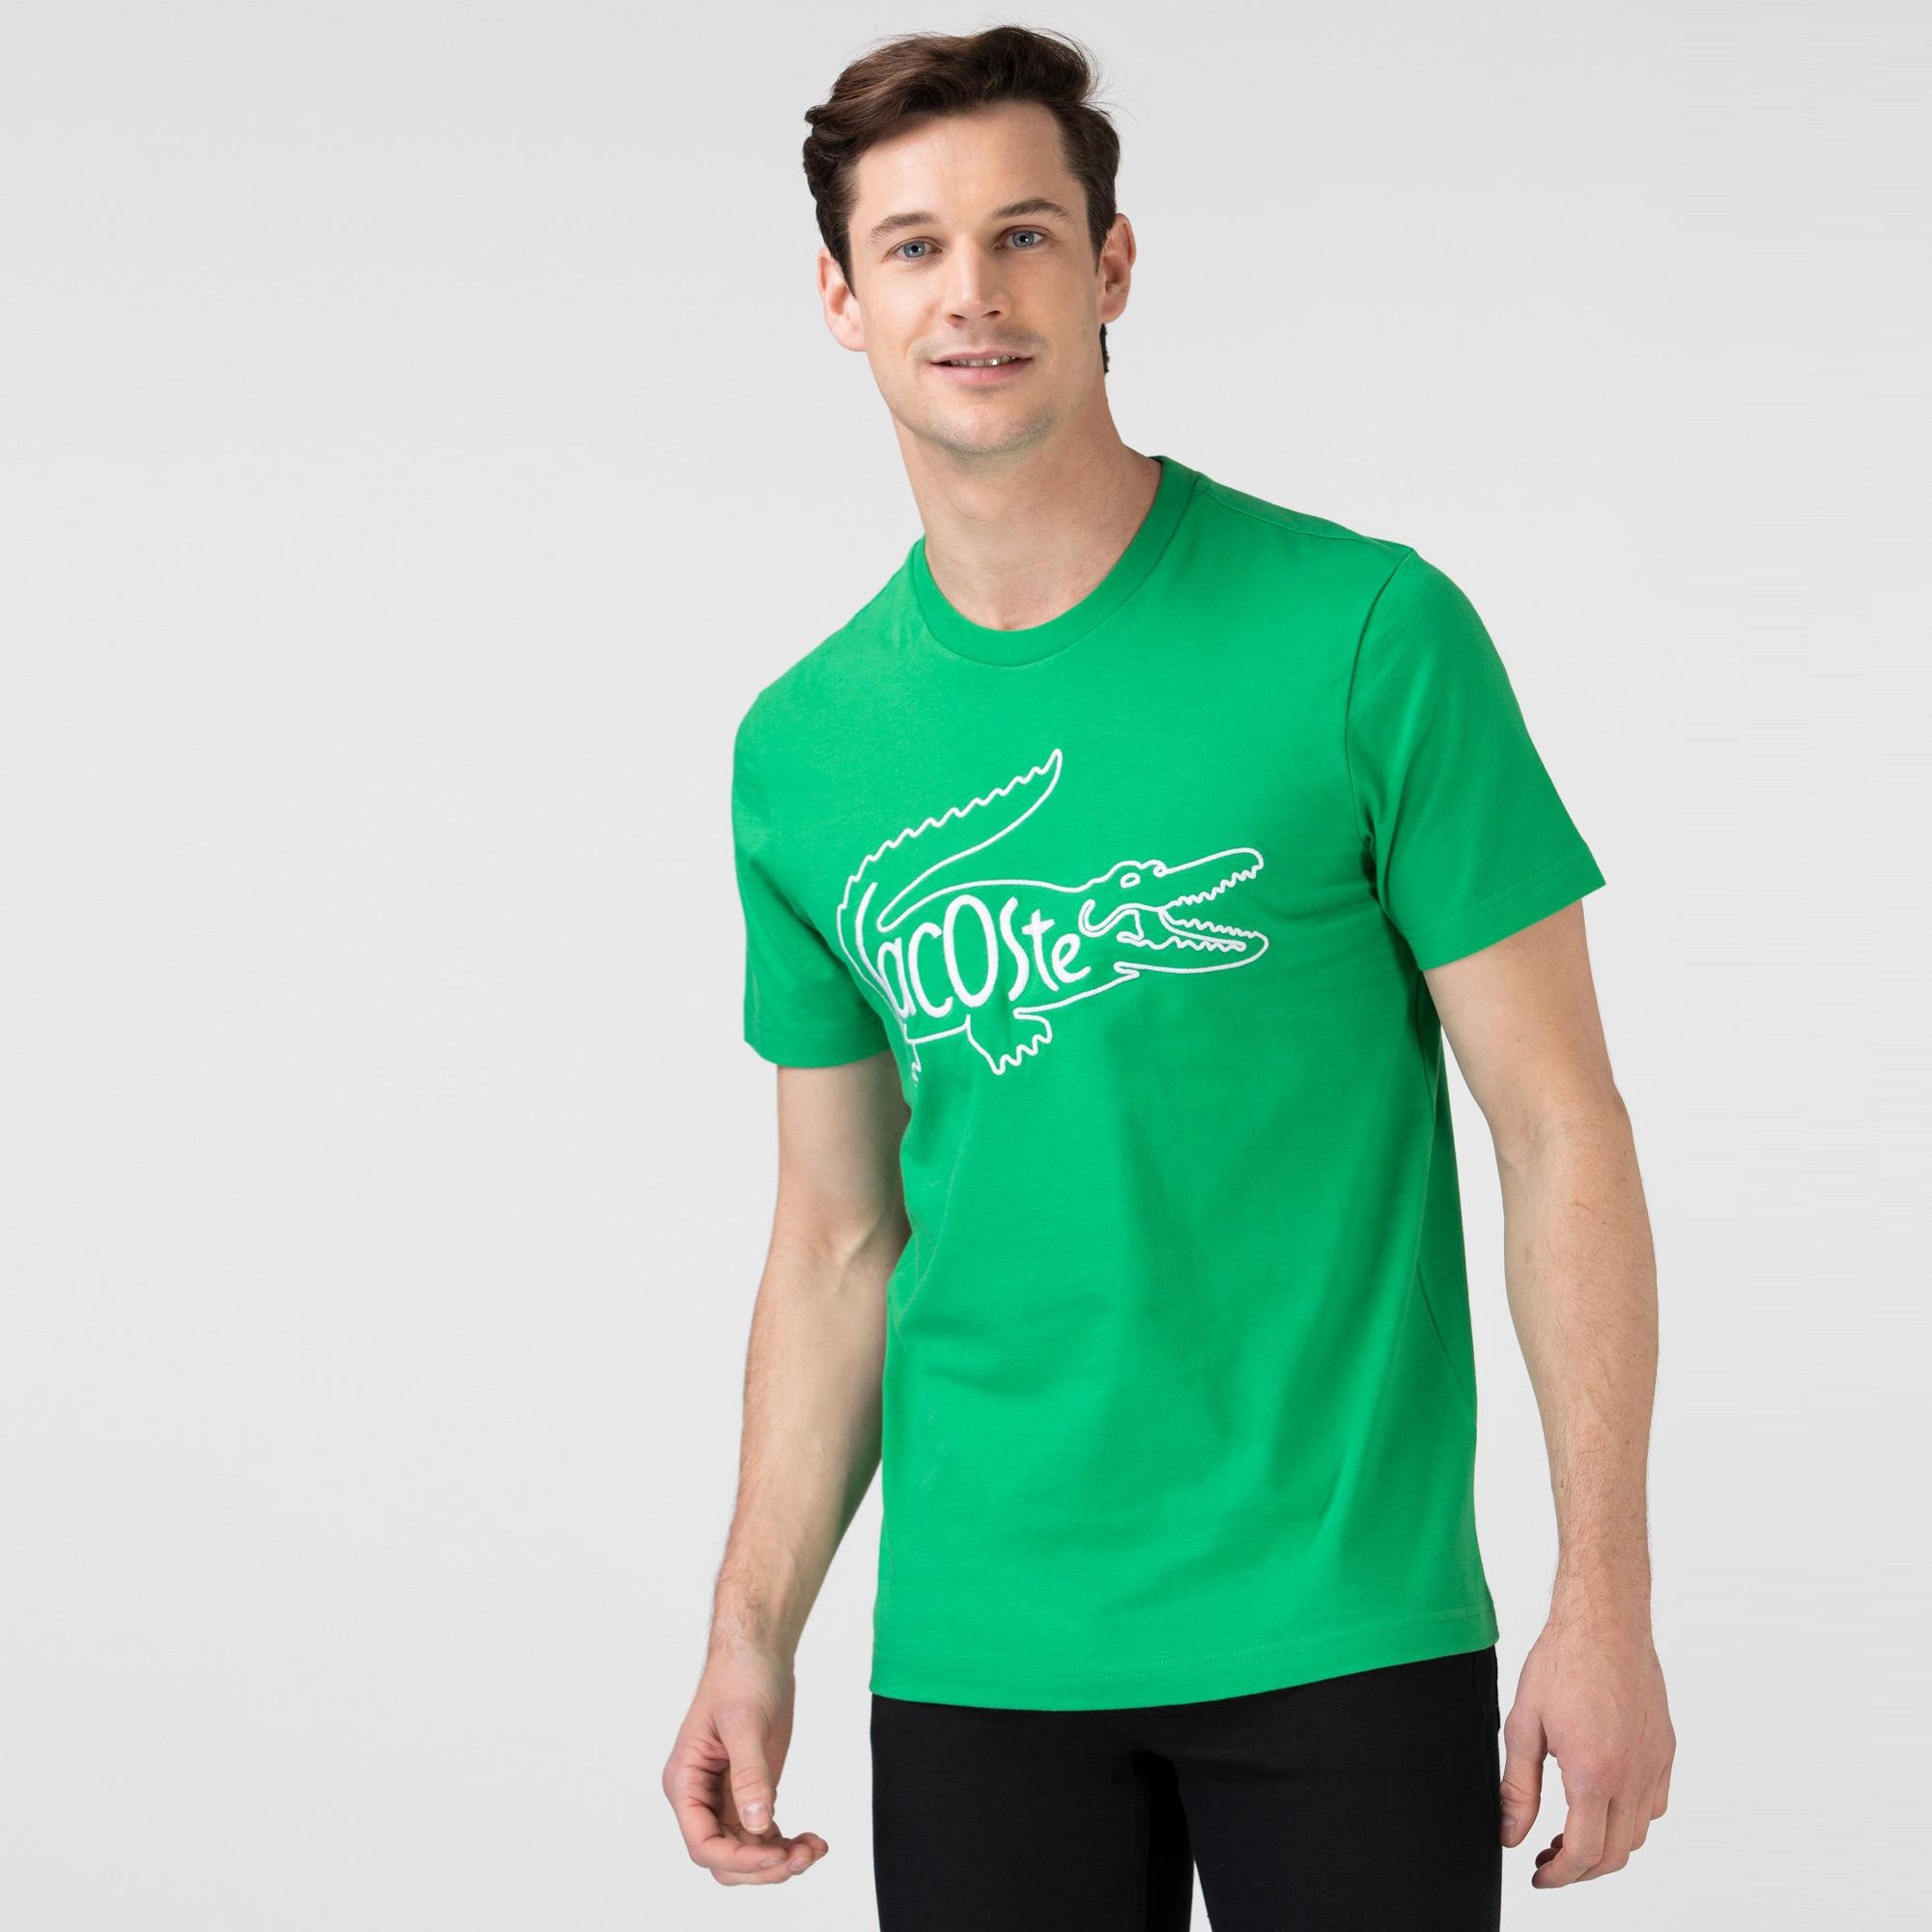 Lacoste Erkek Regular Fit Bisiklet Yaka Nakışlı Yeşil T-Shirt